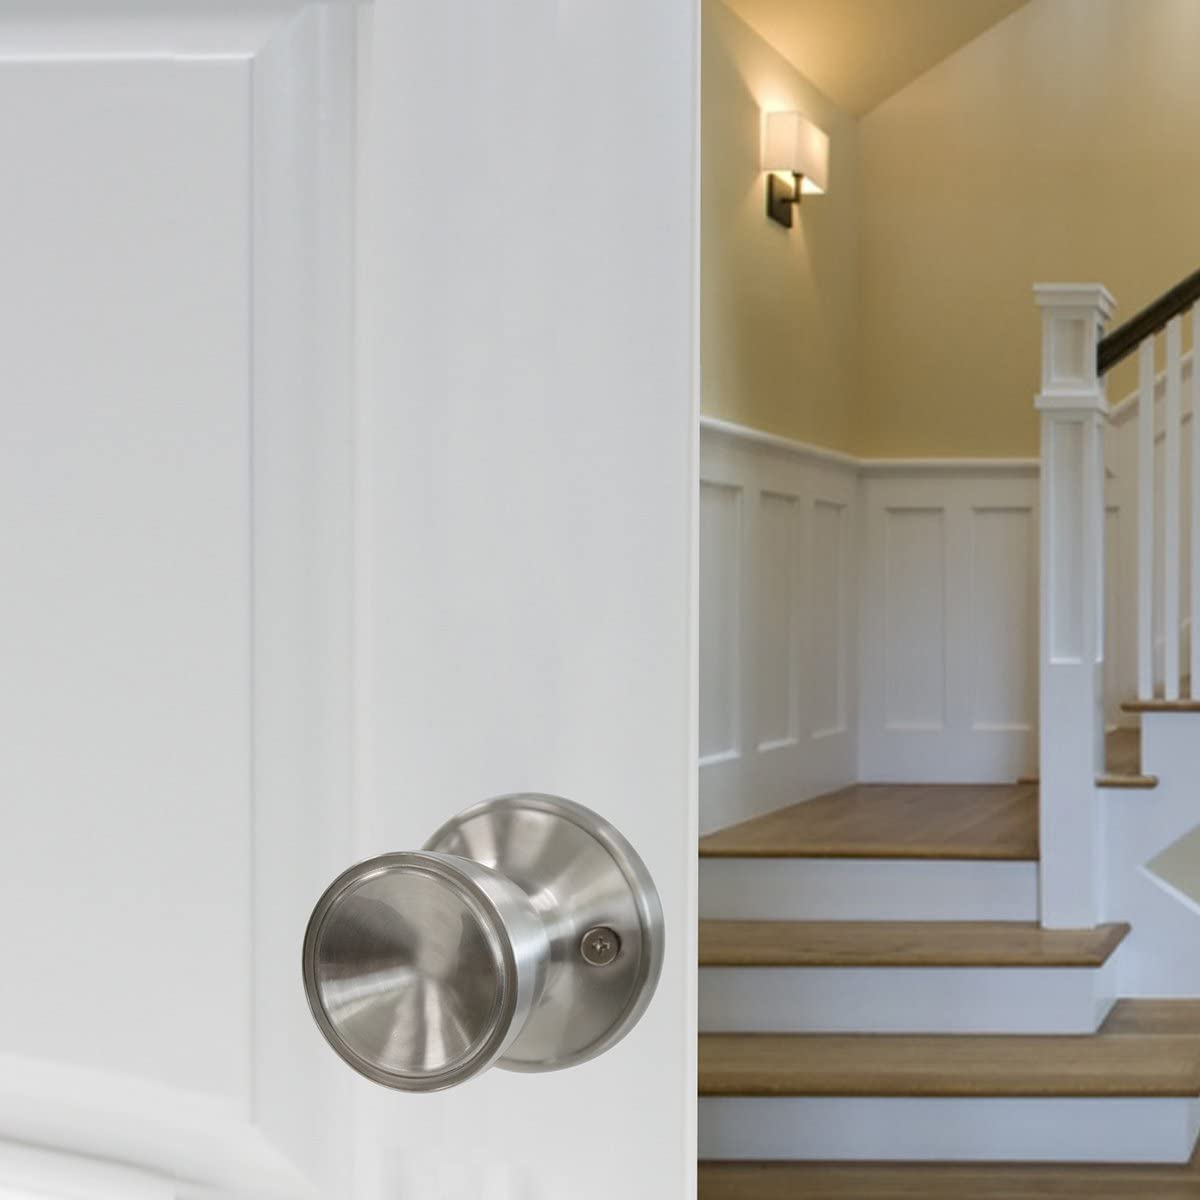 Probrico Half Dummy Door Handles Levers Single Side Non-Turning Door Handles Left Handing Pack of 2 for Closets with a Satin Nickel Finish